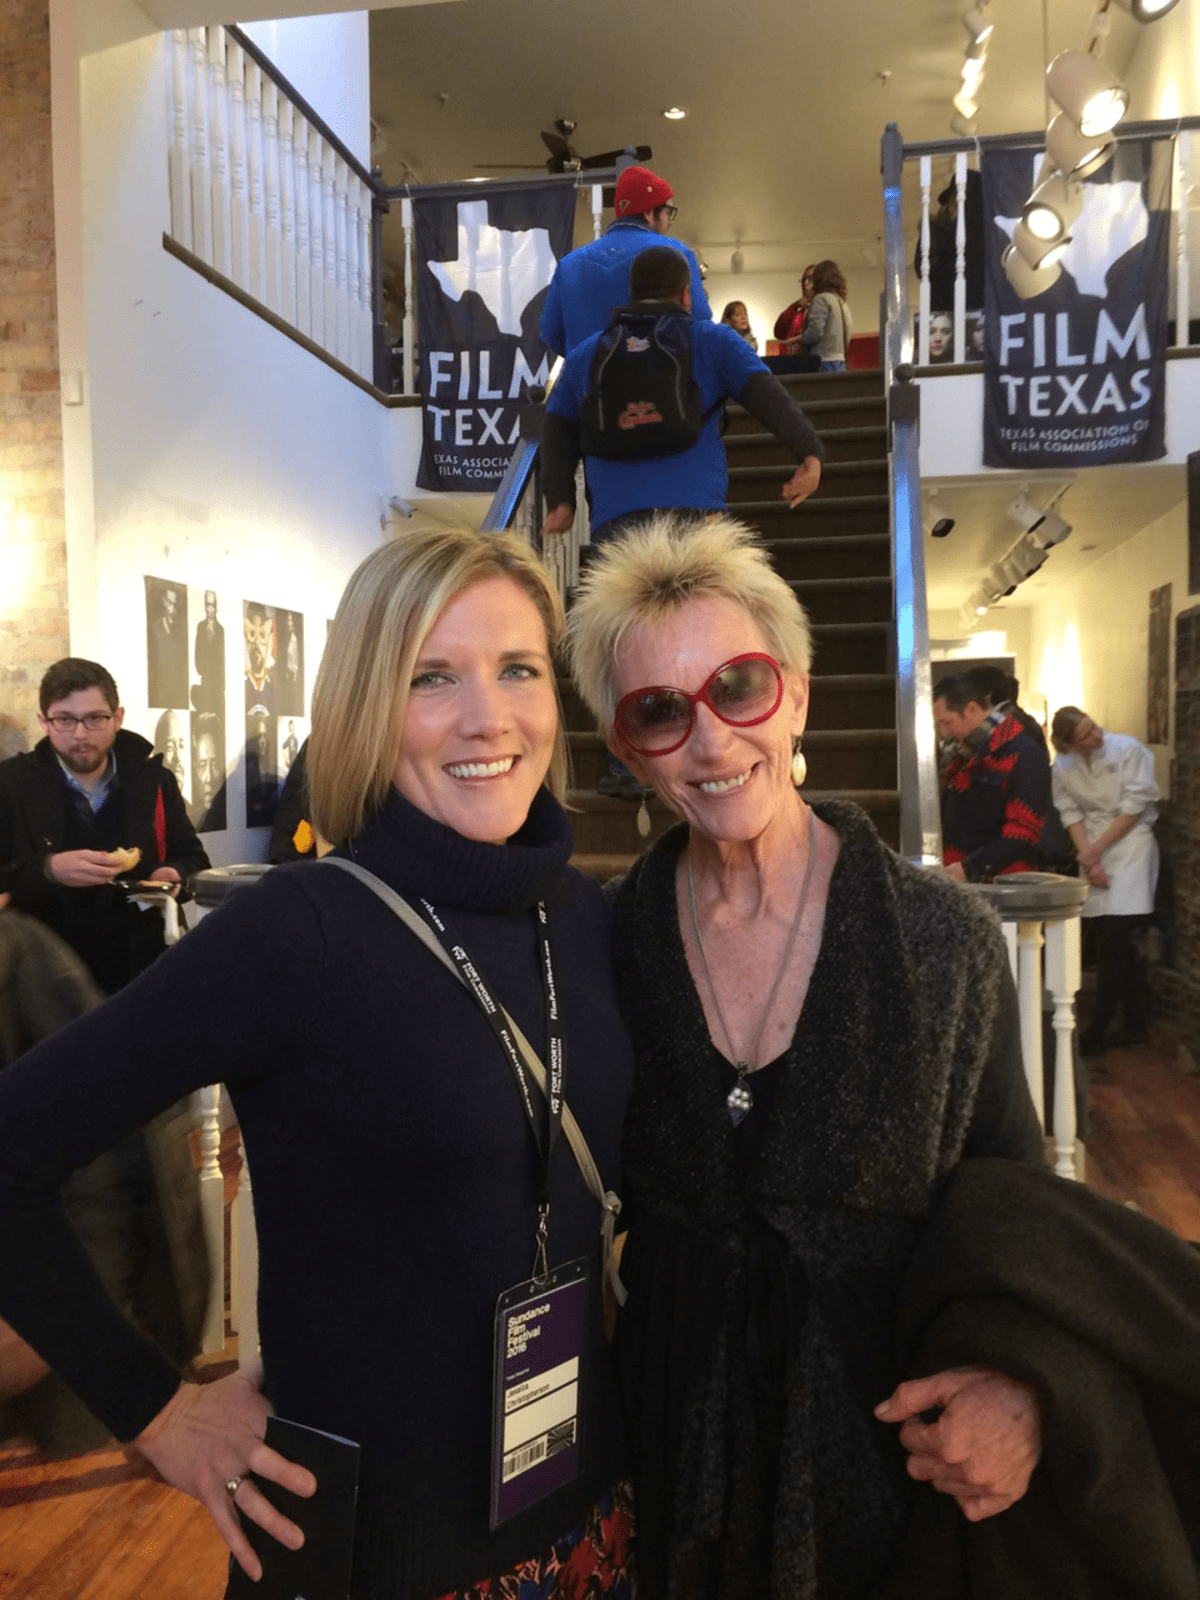 Jessica Christopherson, Deborah Grotfeldt at Film Texas reception at Sundance Film Festival